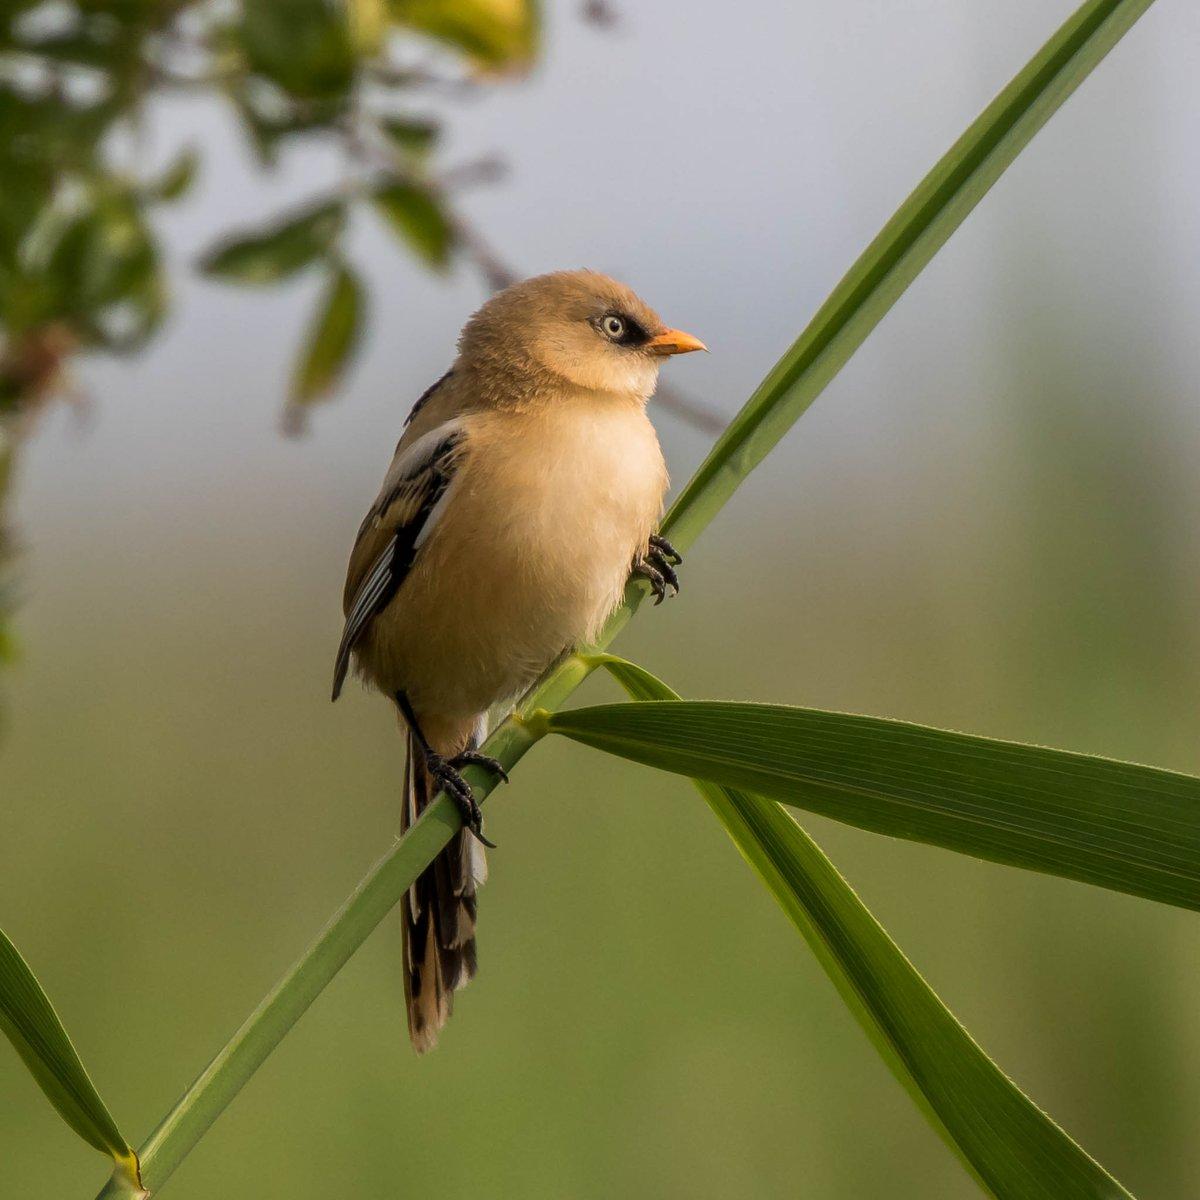 Bearded reedling #Birds pic.twitter.com/FxtAzqtyw0